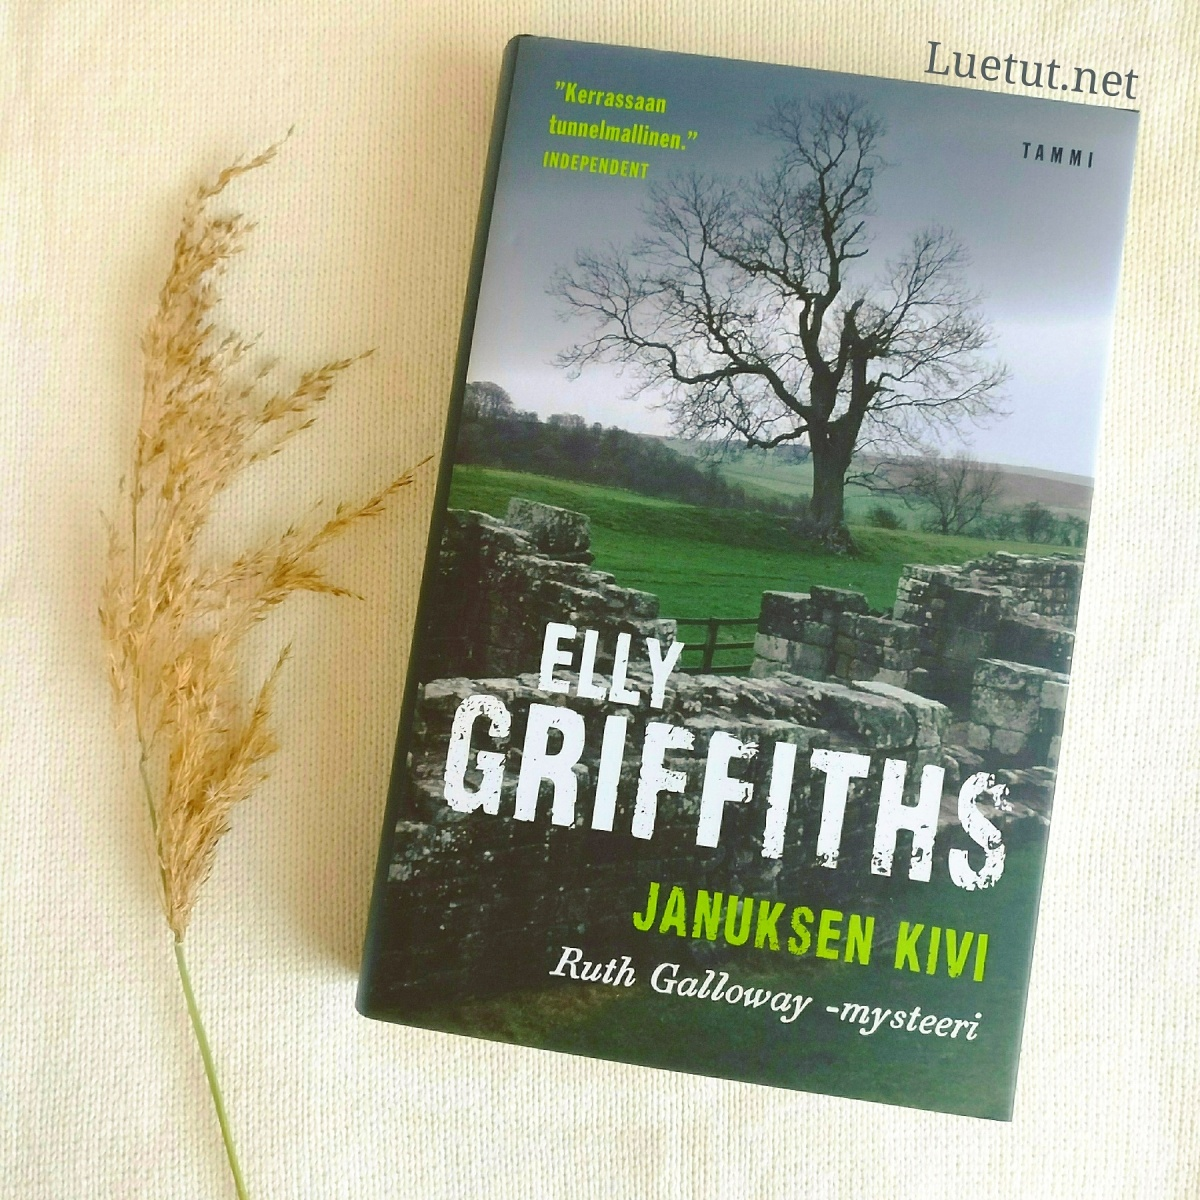 Elly Griffiths: Januksen kivi